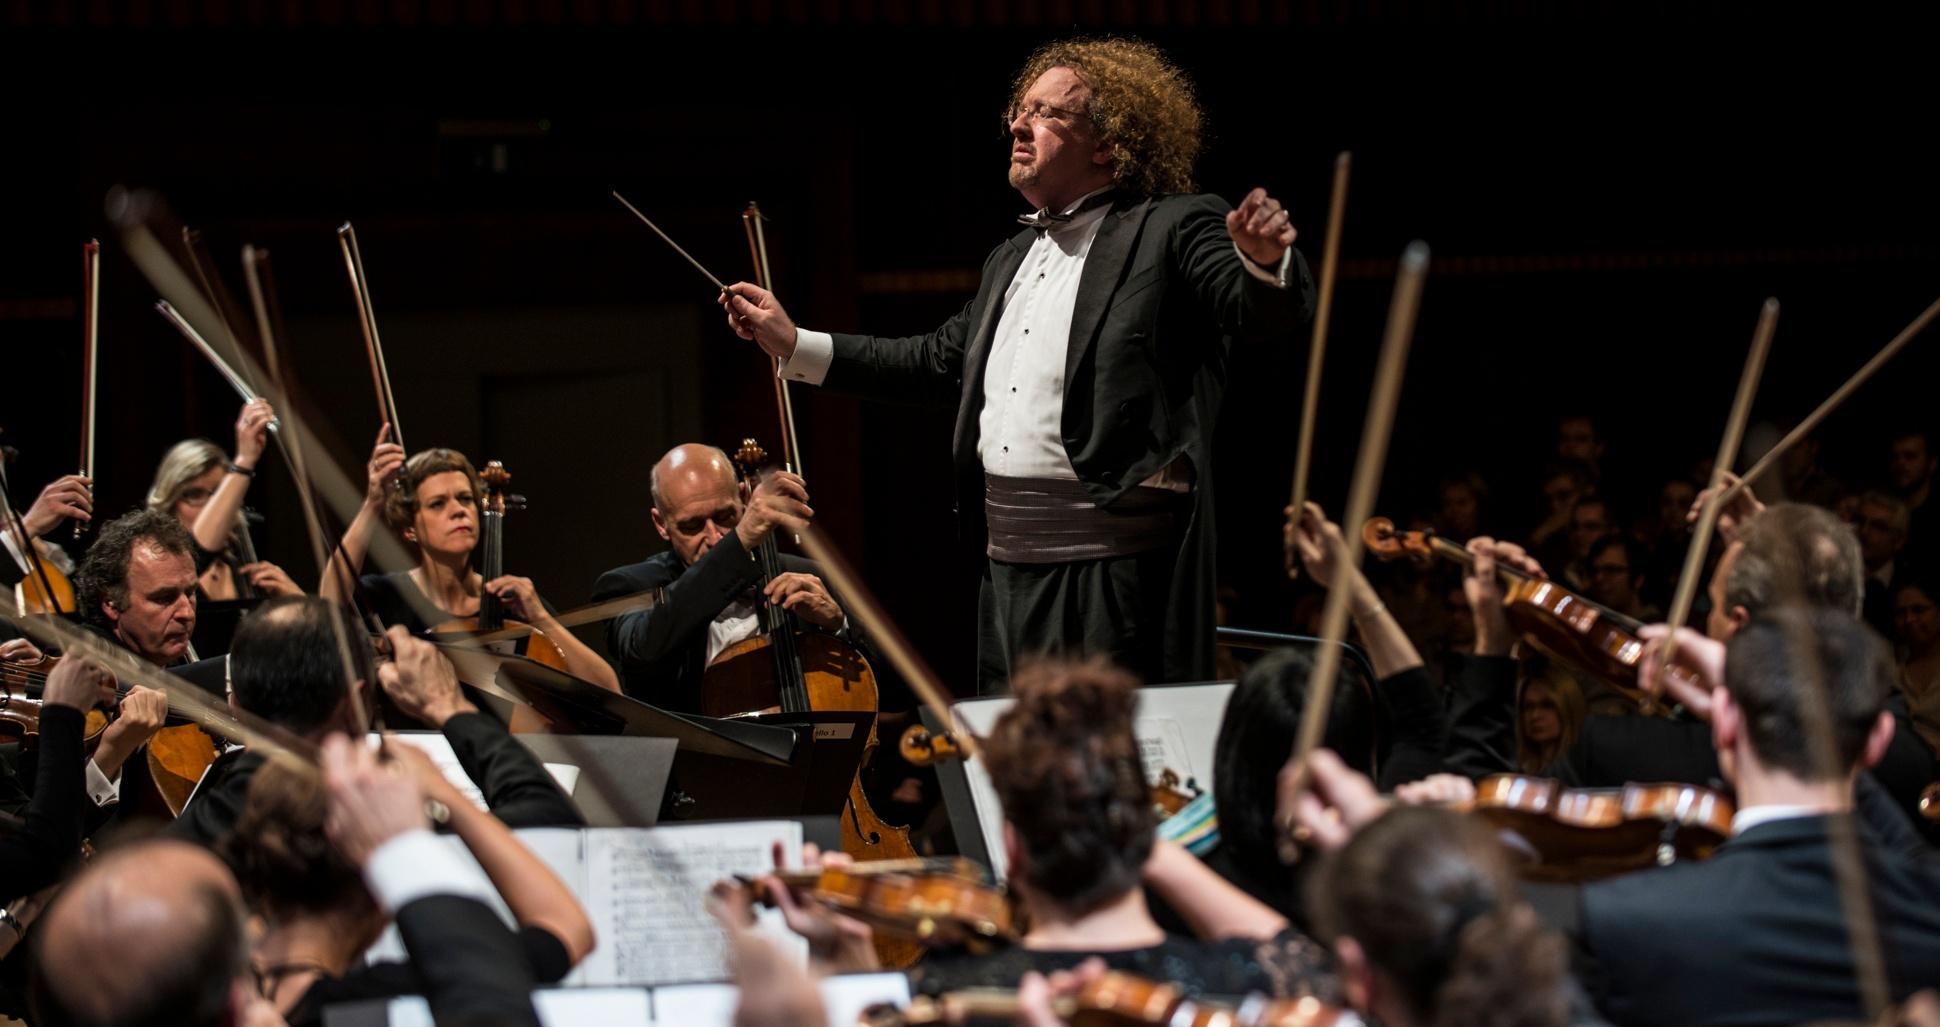 Brussels Philharmonic copy.jpg